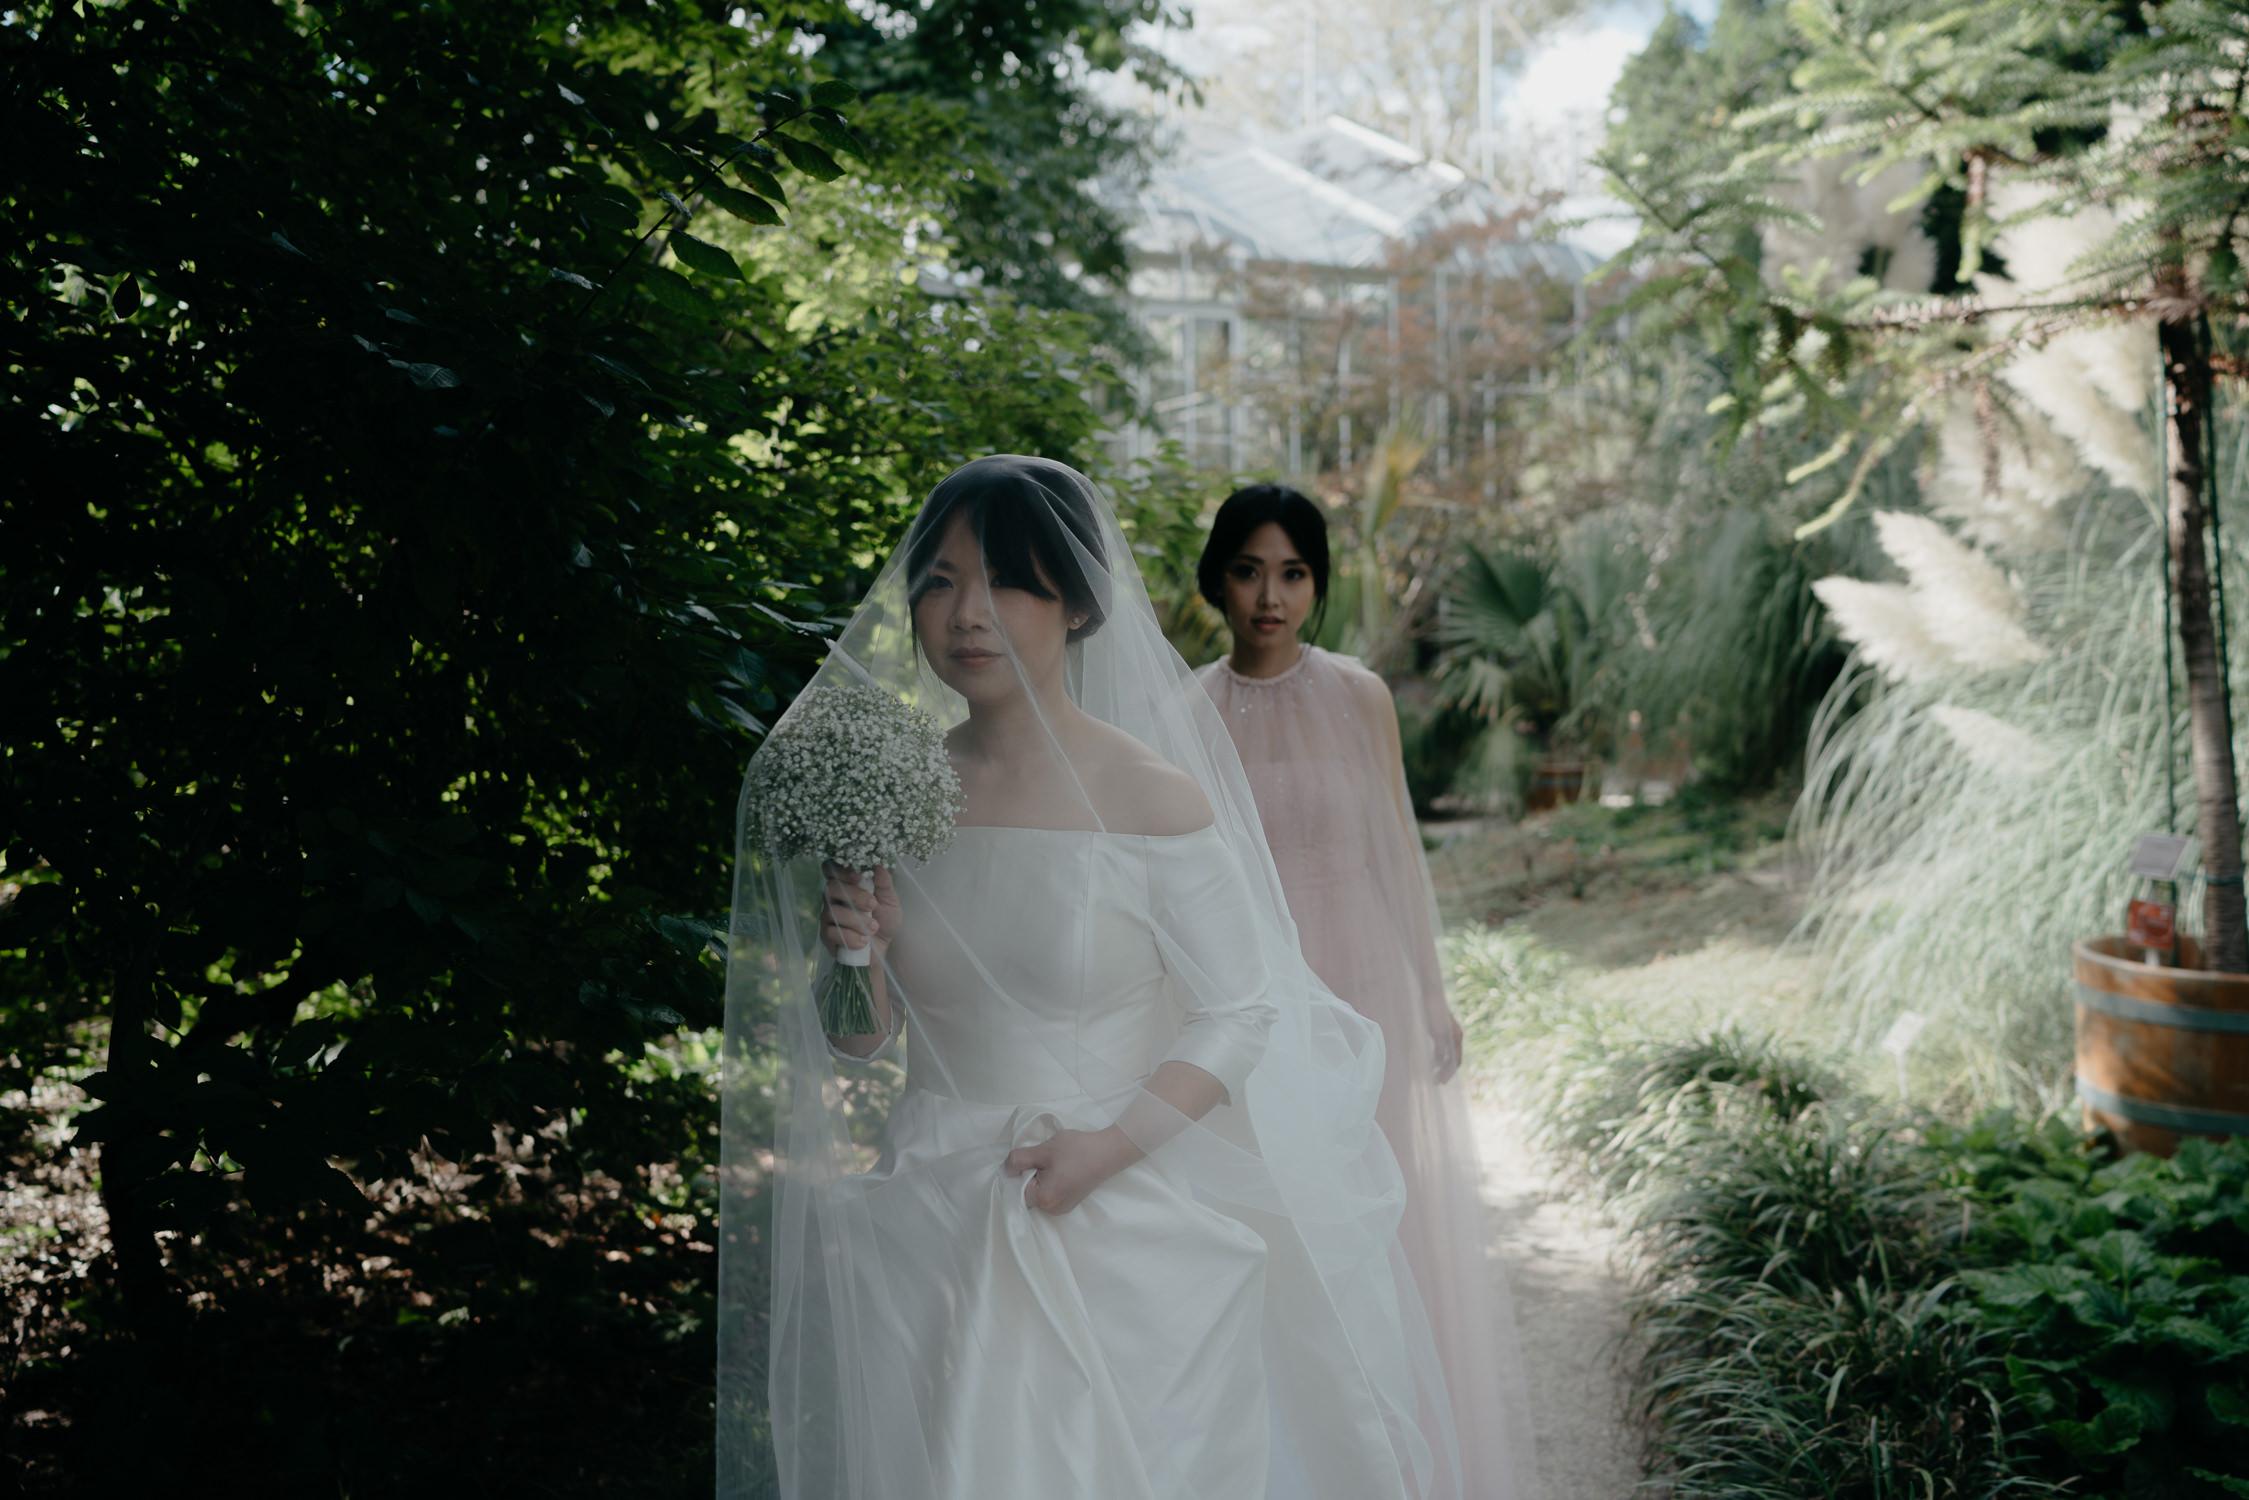 best wedding photography  at hortus botanicus in amsterdam